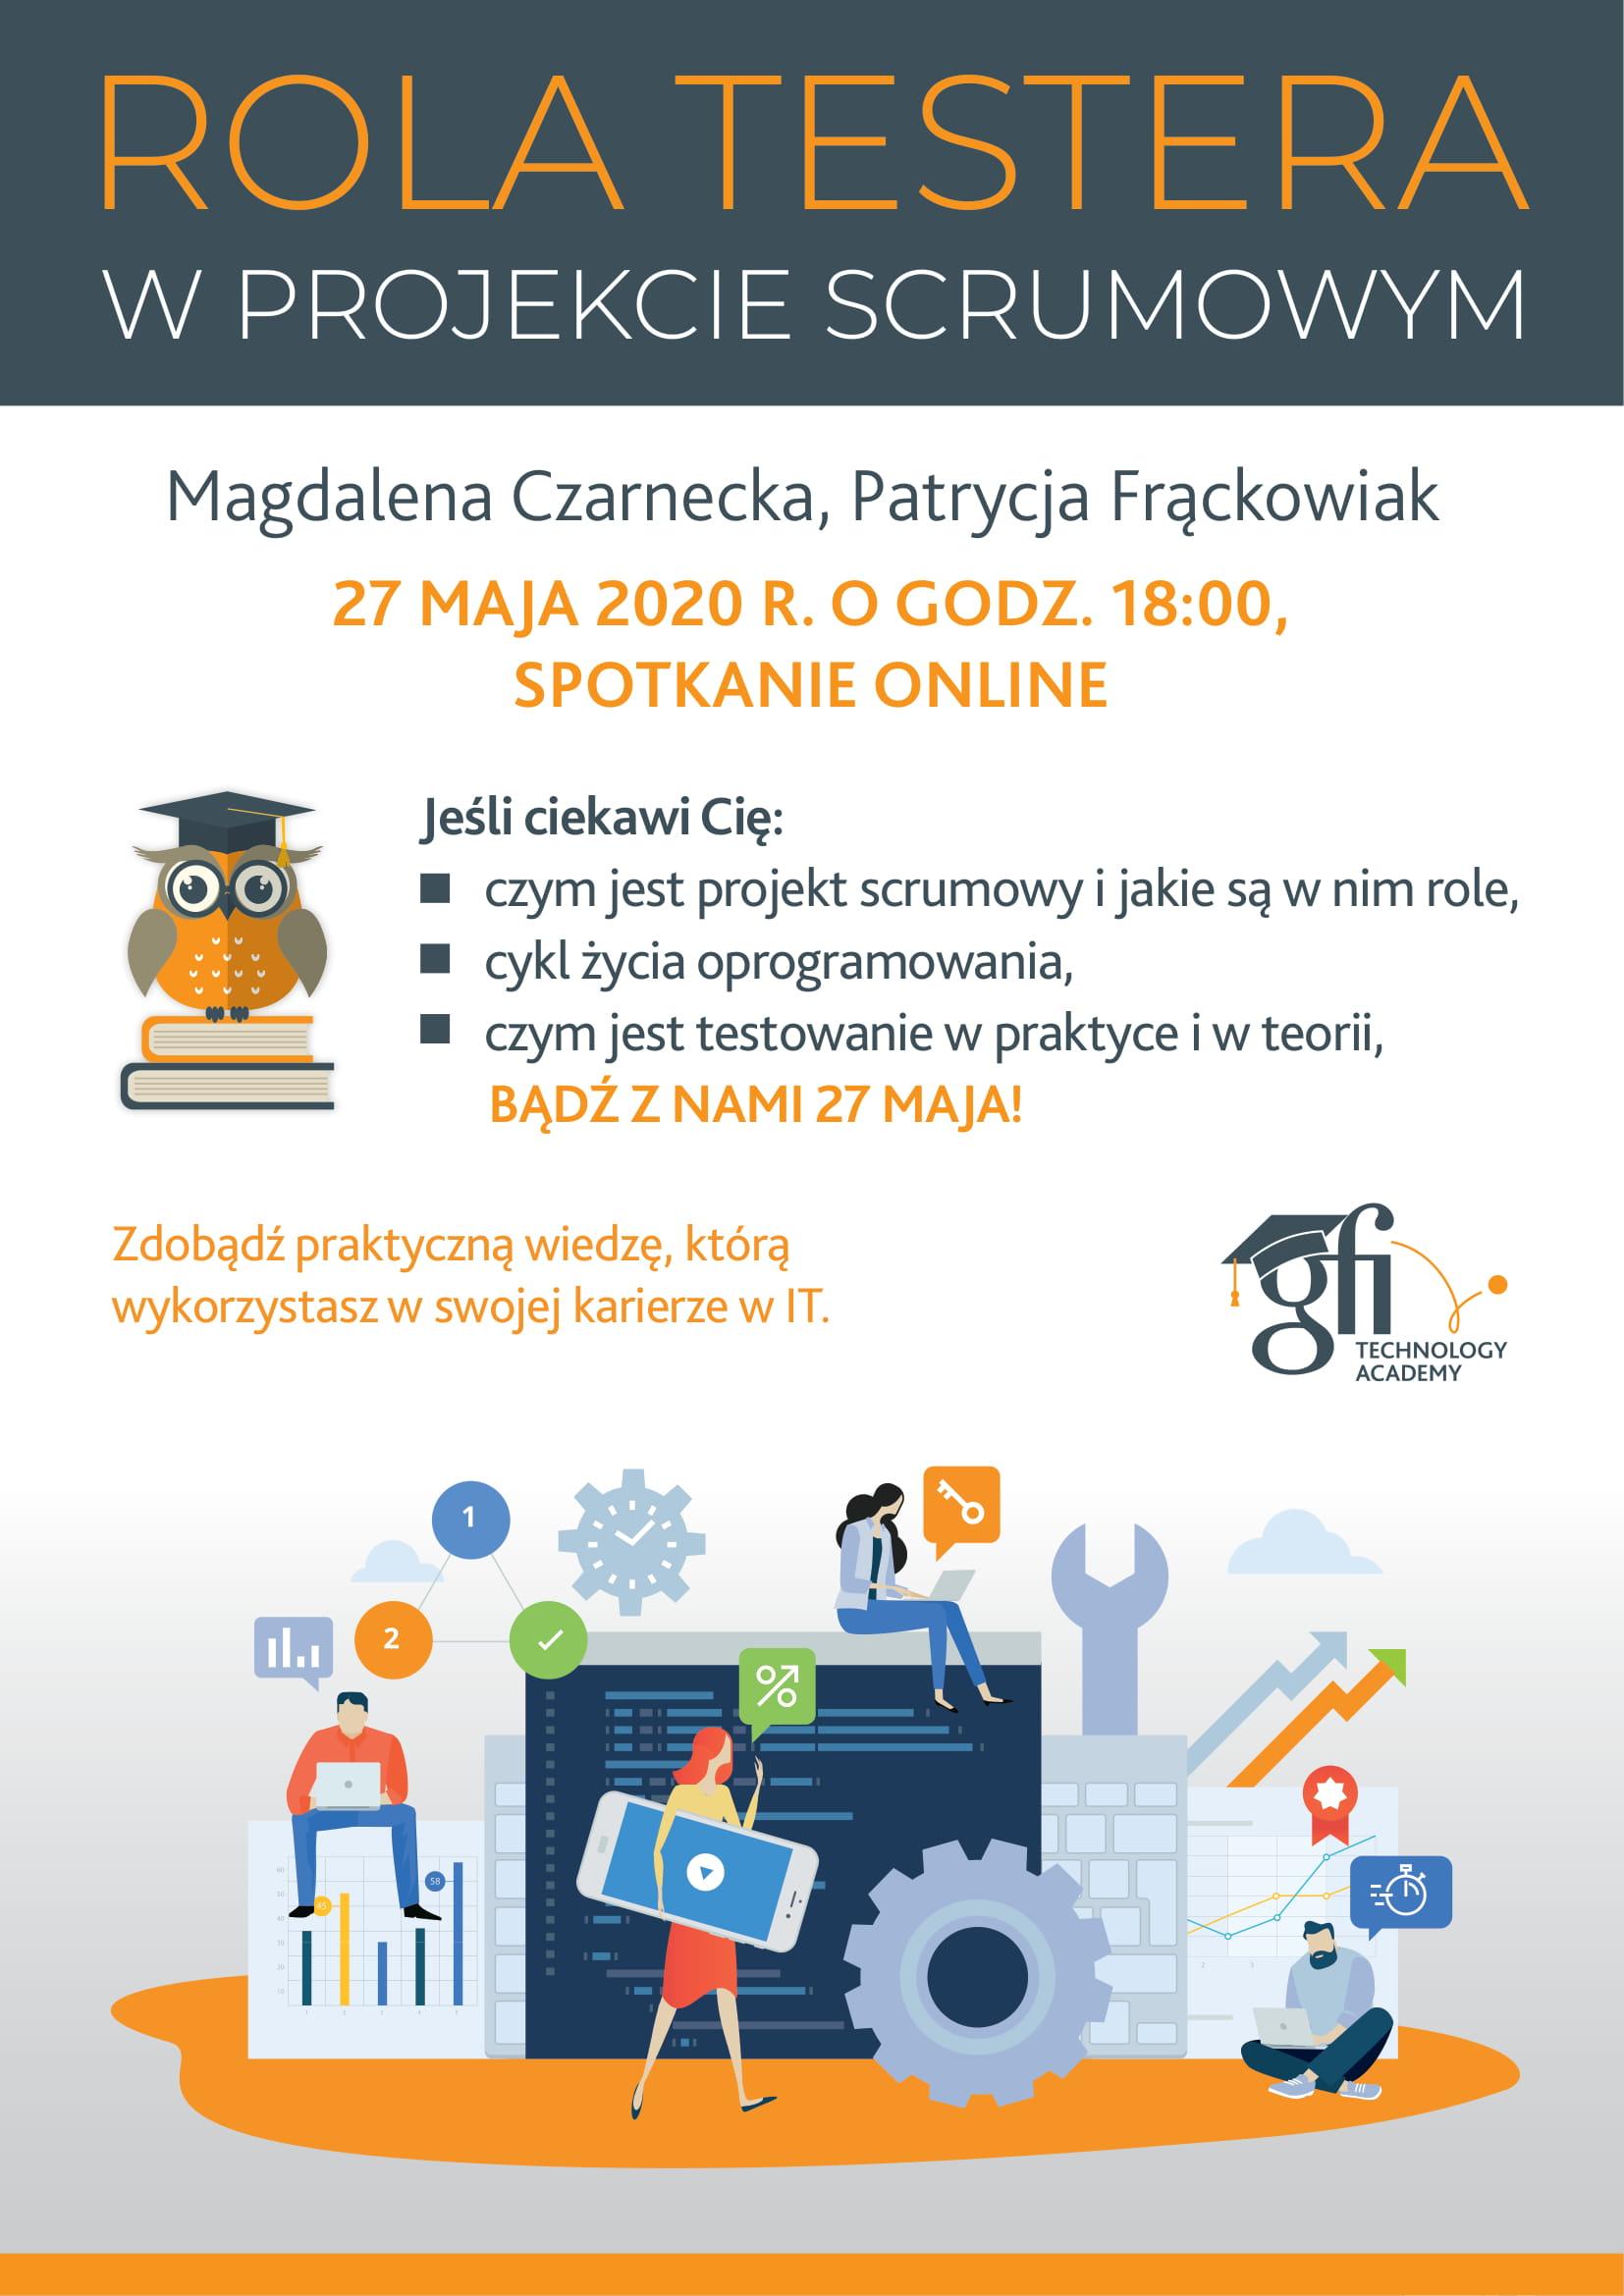 Gfi Poland - Webinar dla studentów